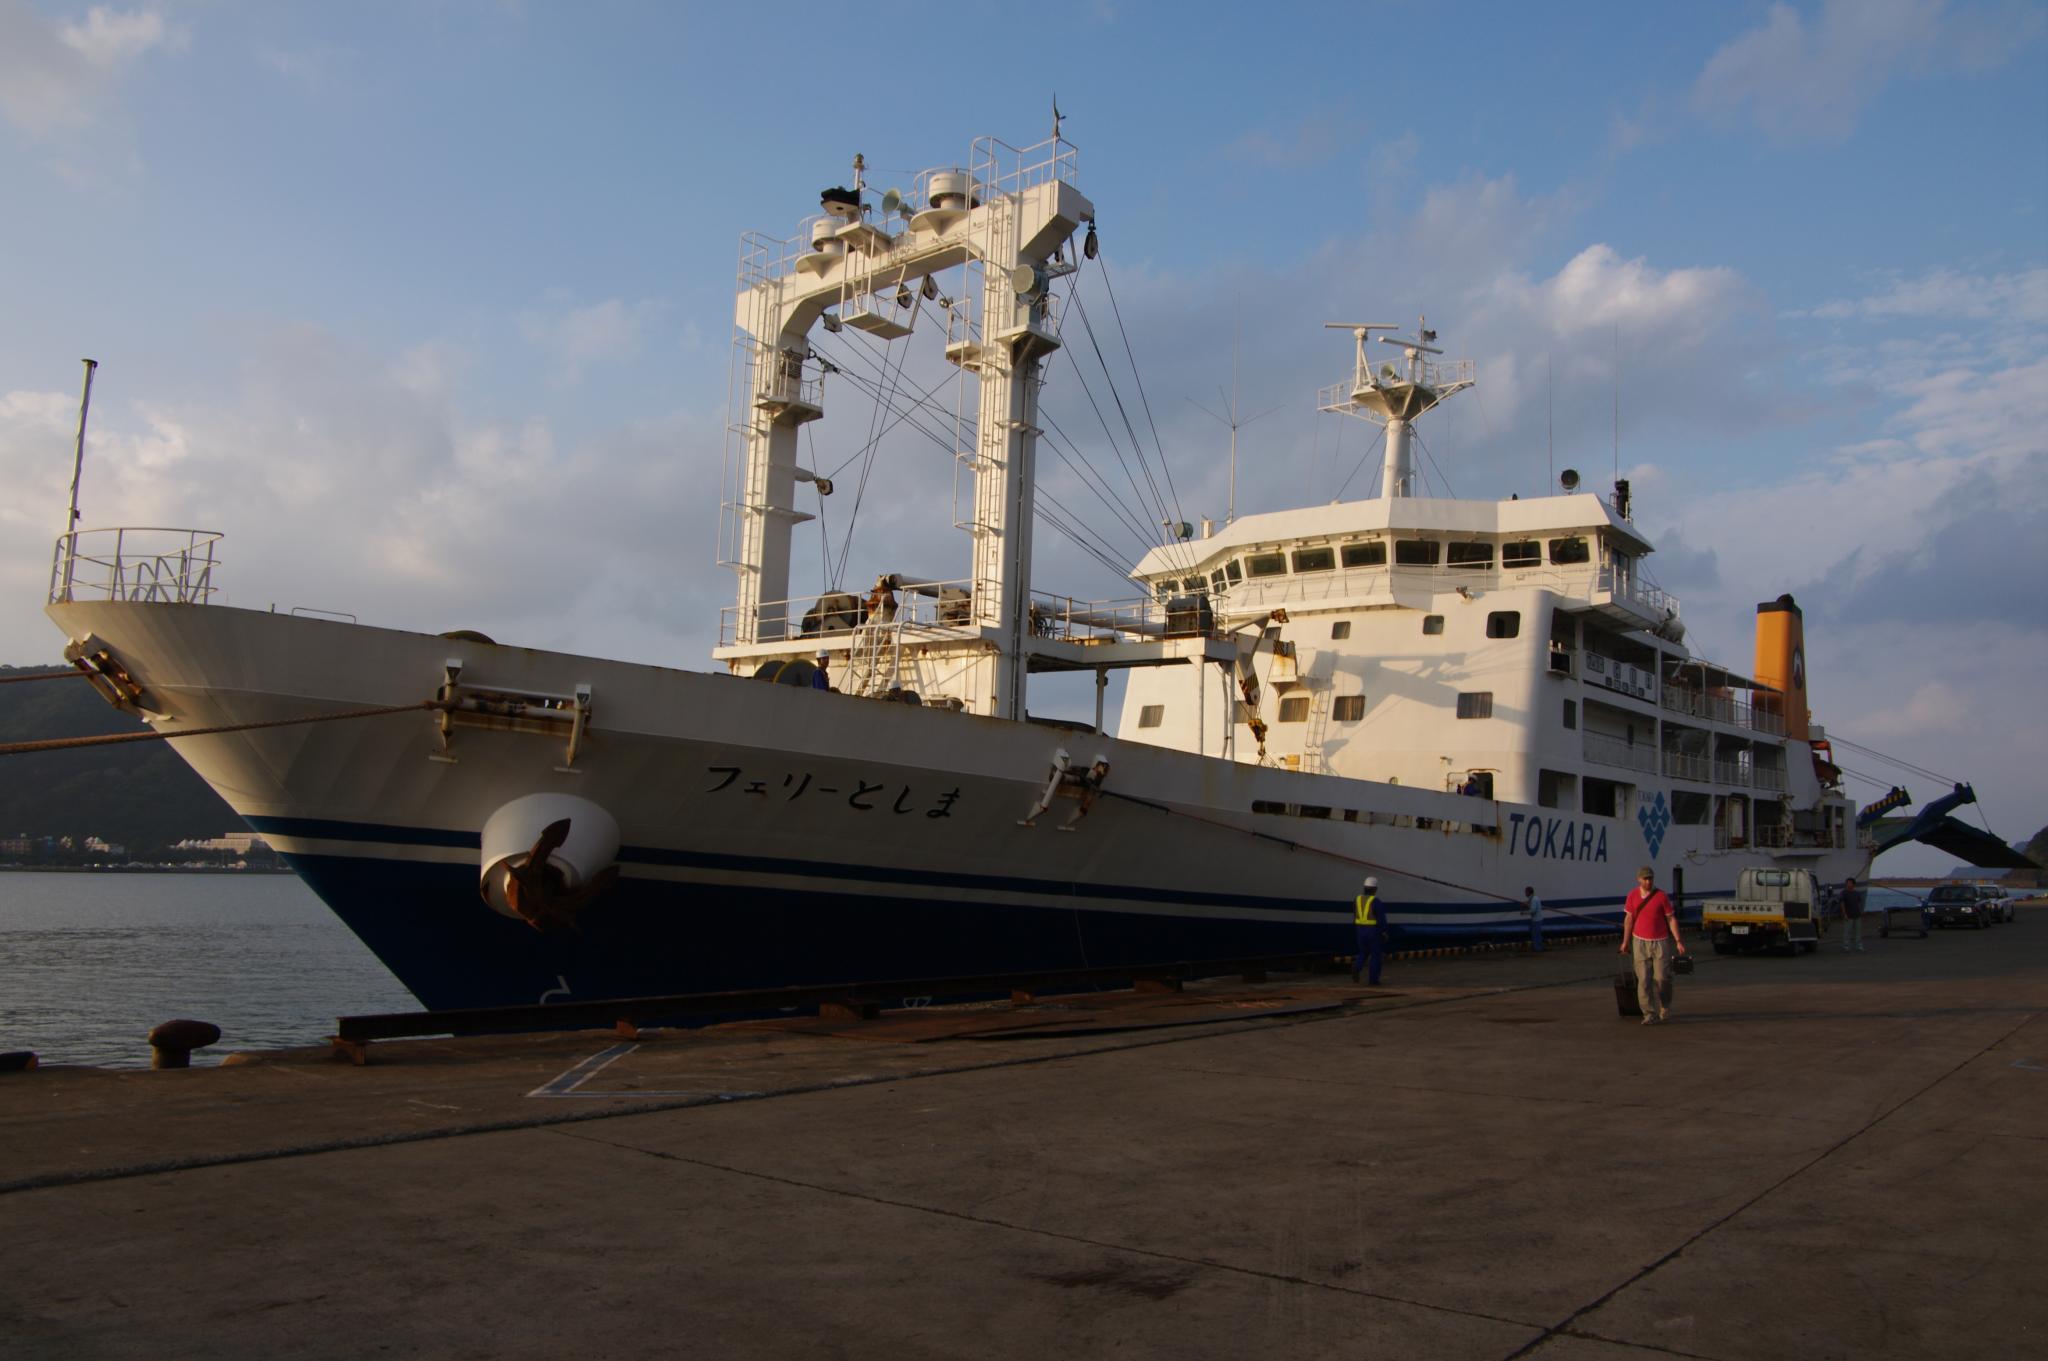 Ferry Toshima